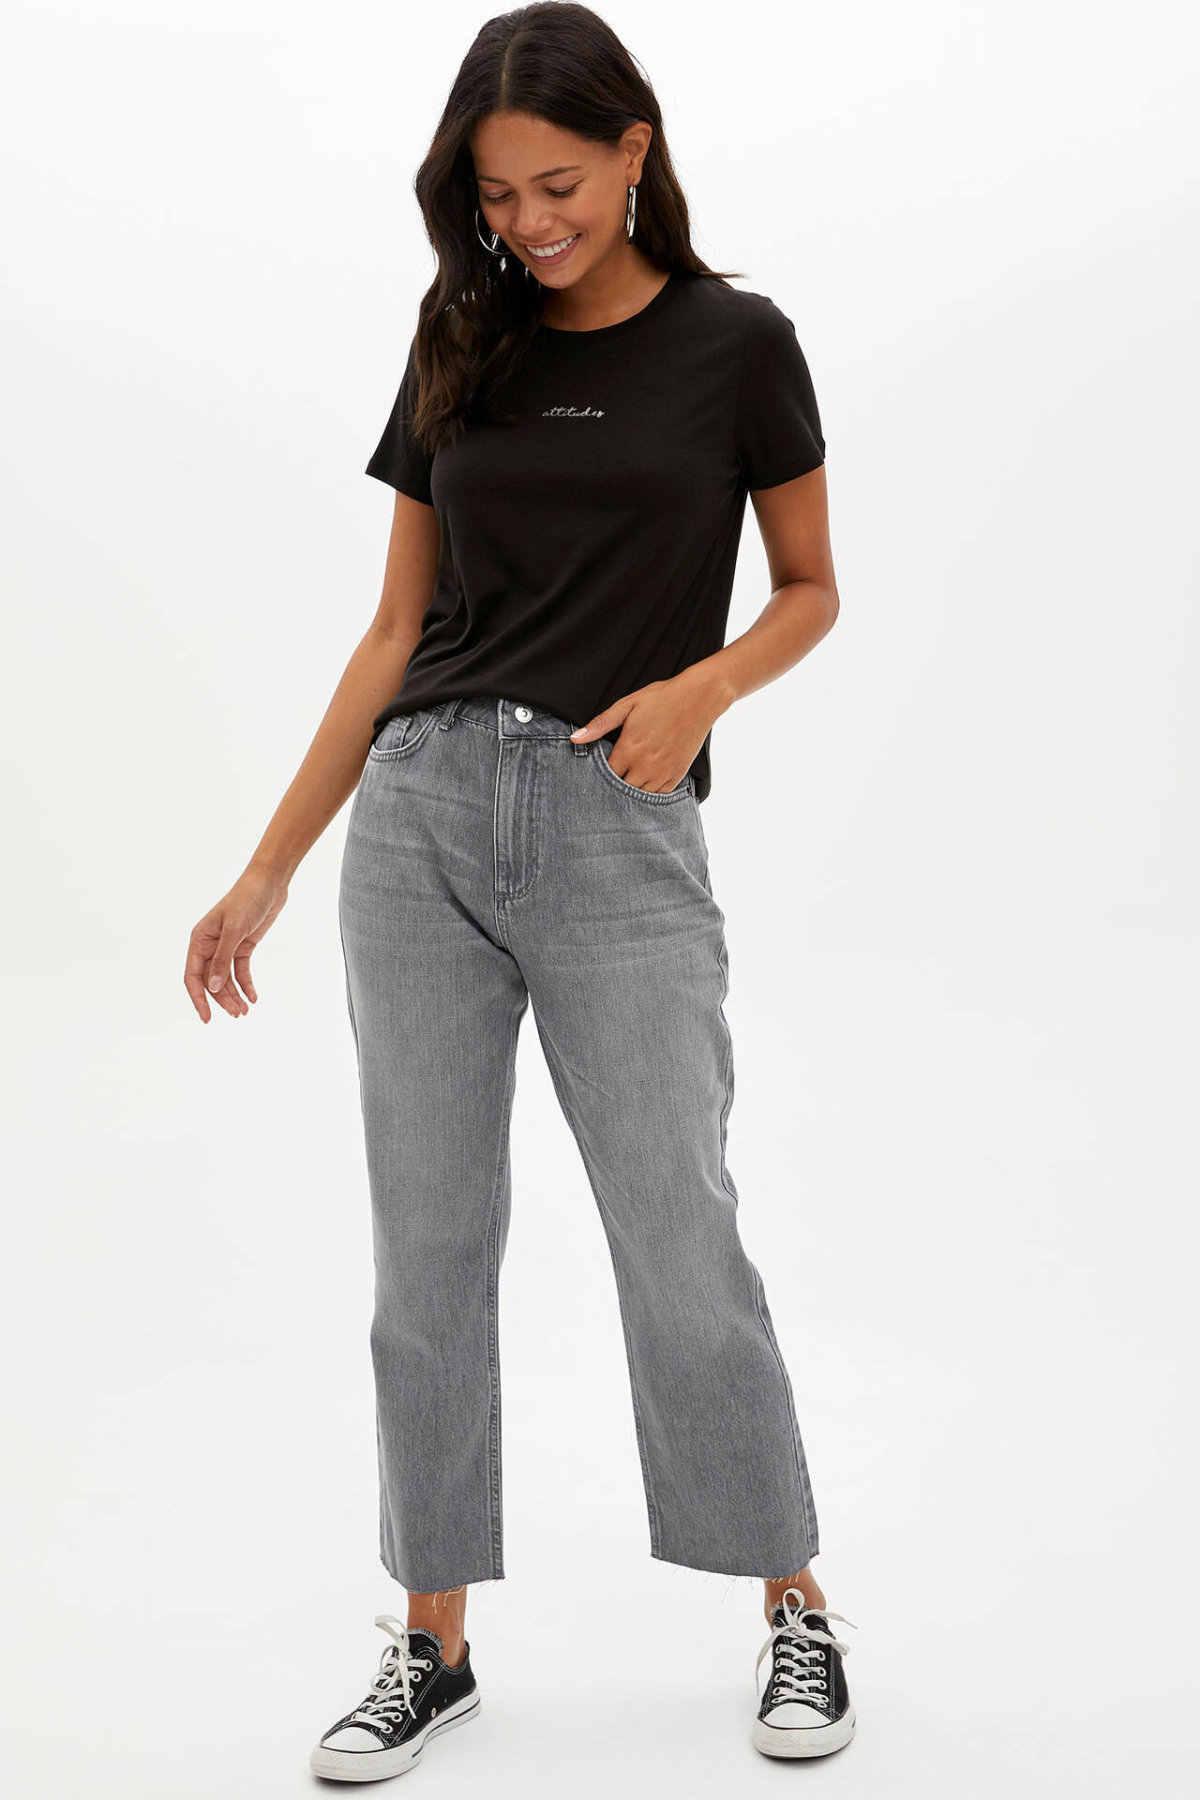 Defacto Musim Panas Wanita O-Leher Lengan Pendek T-shirt Wanita Fashion Pola Huruf Atasan Wanita Kasual Sweatshirt Baru-L6533AZ19AU